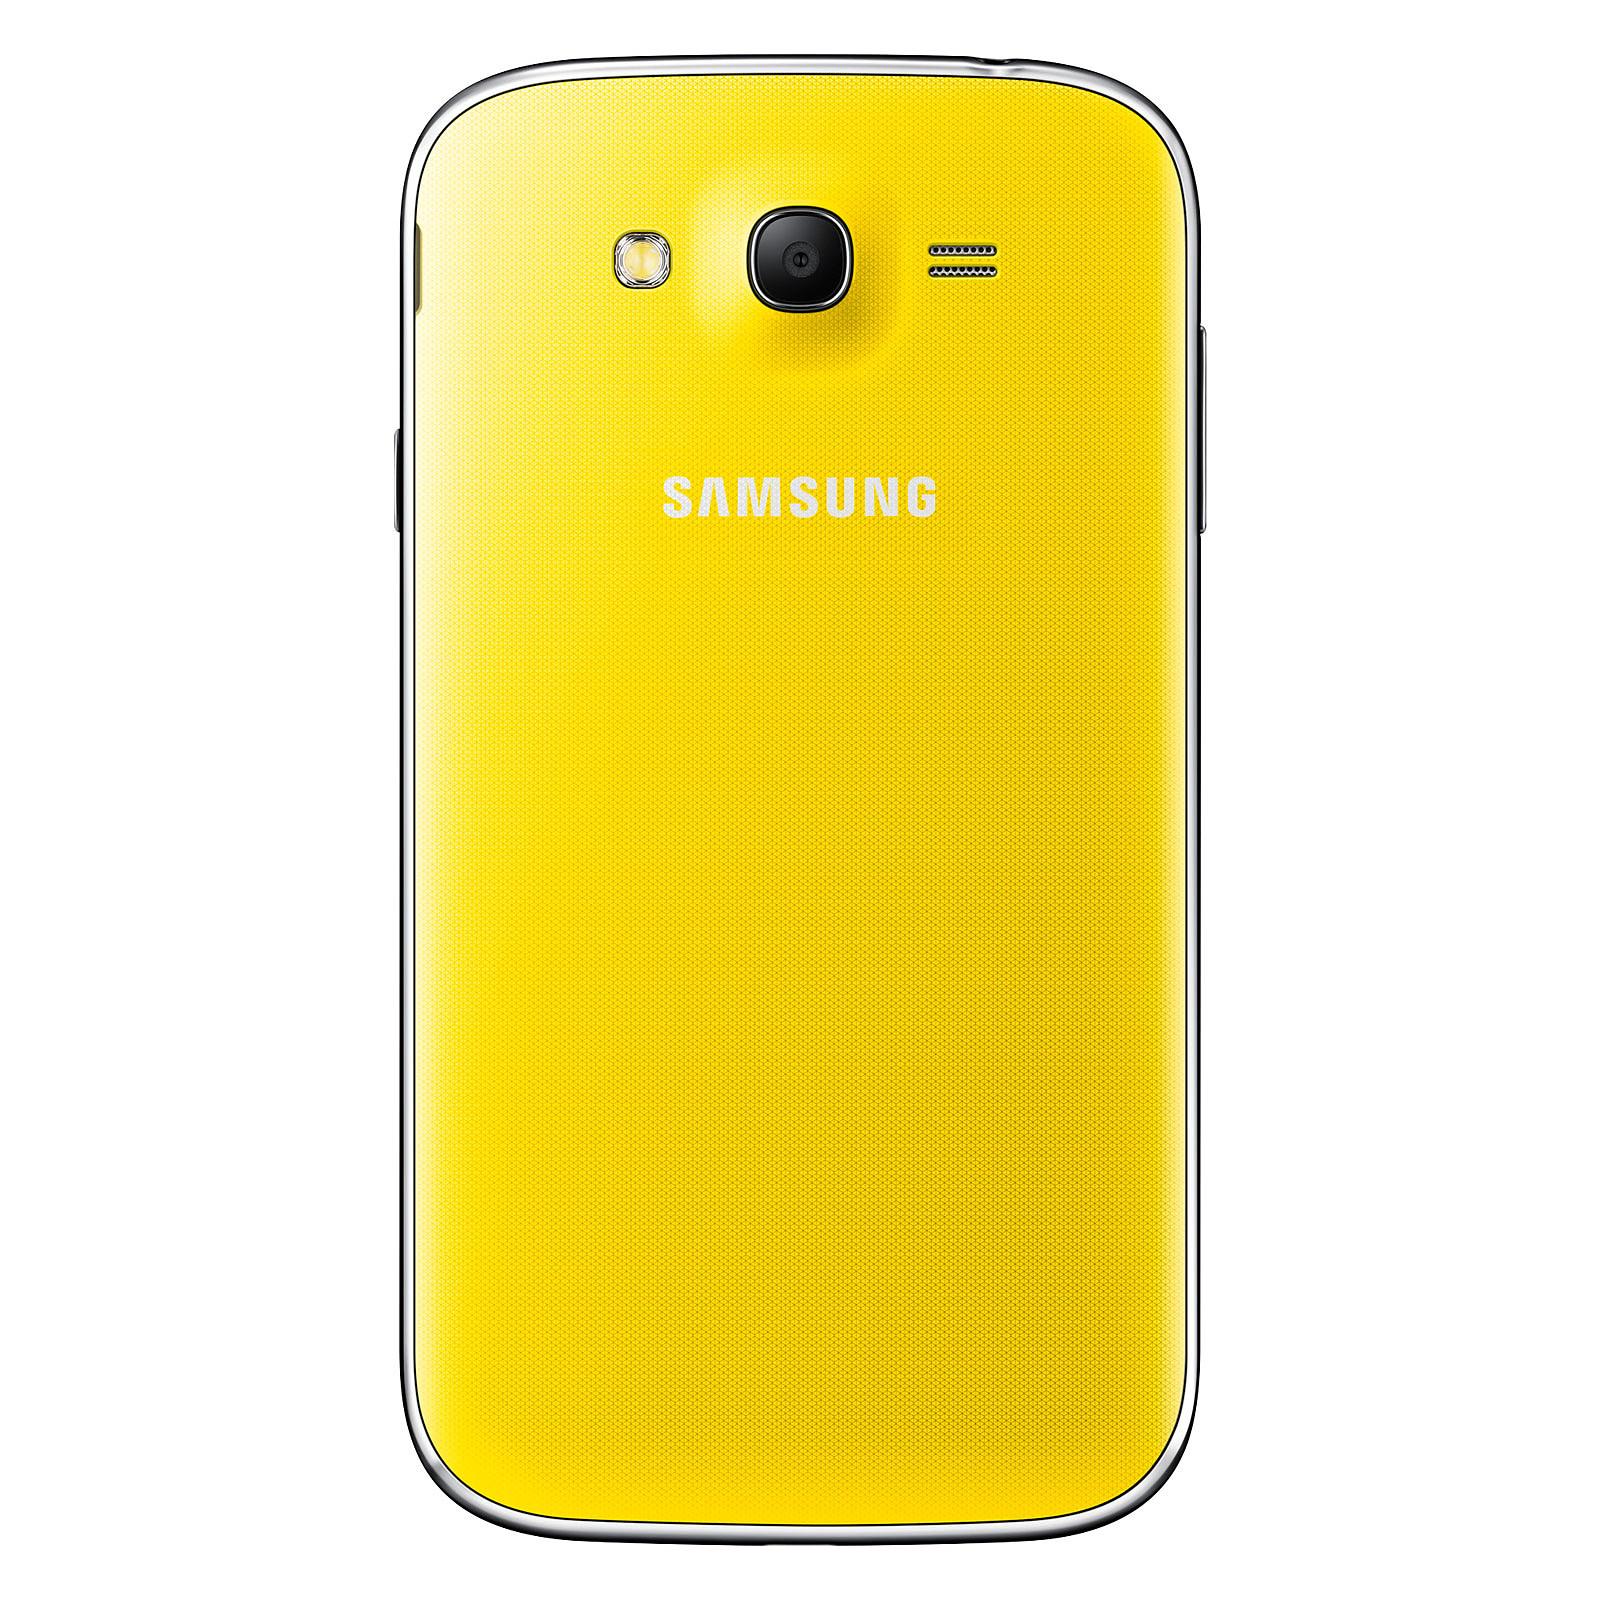 Samsung Galaxy Grand Lite GT-I9060 Jaune - Mobile & smartphone ...